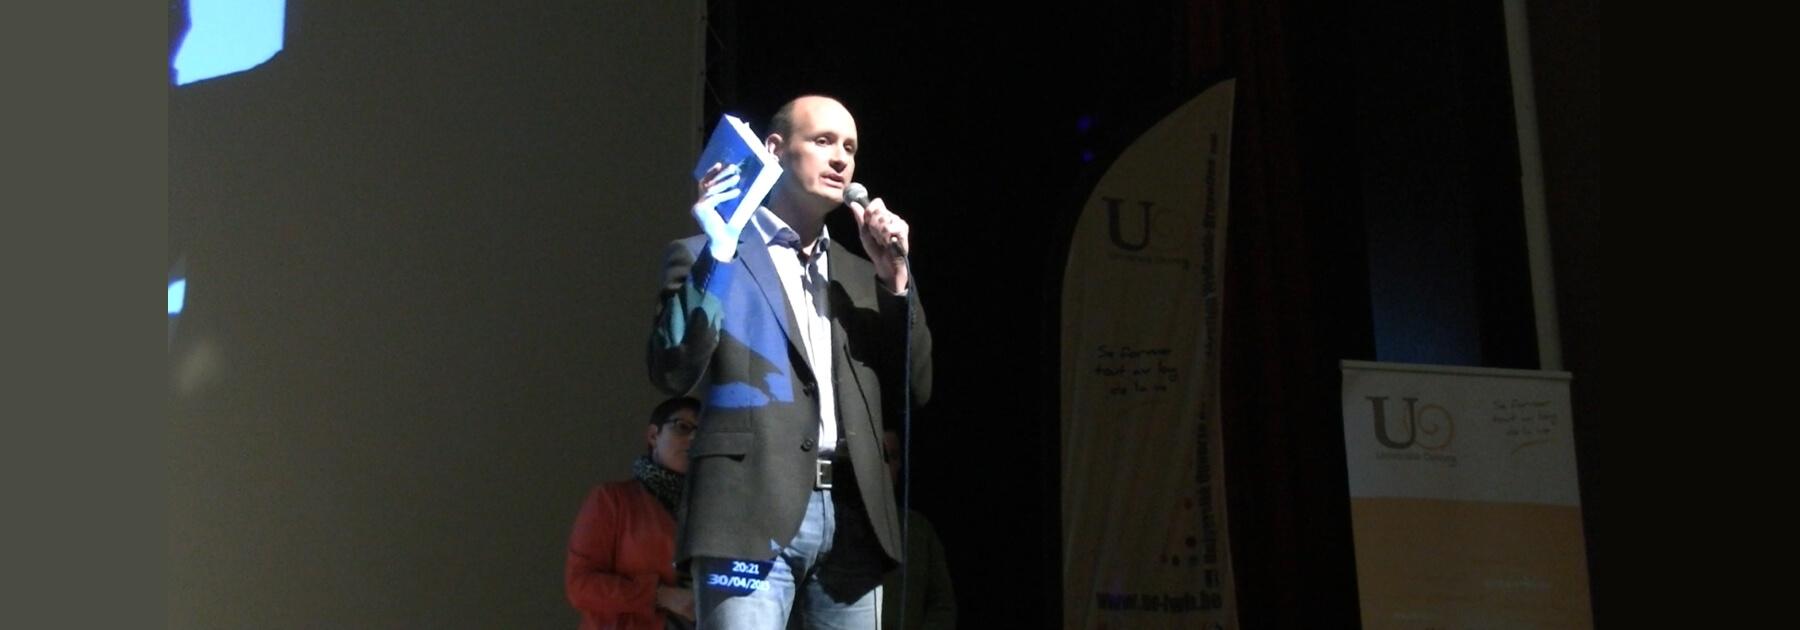 3-Conference-Sauver-l-ecole-universite-ouverte-John-Rizzo-2